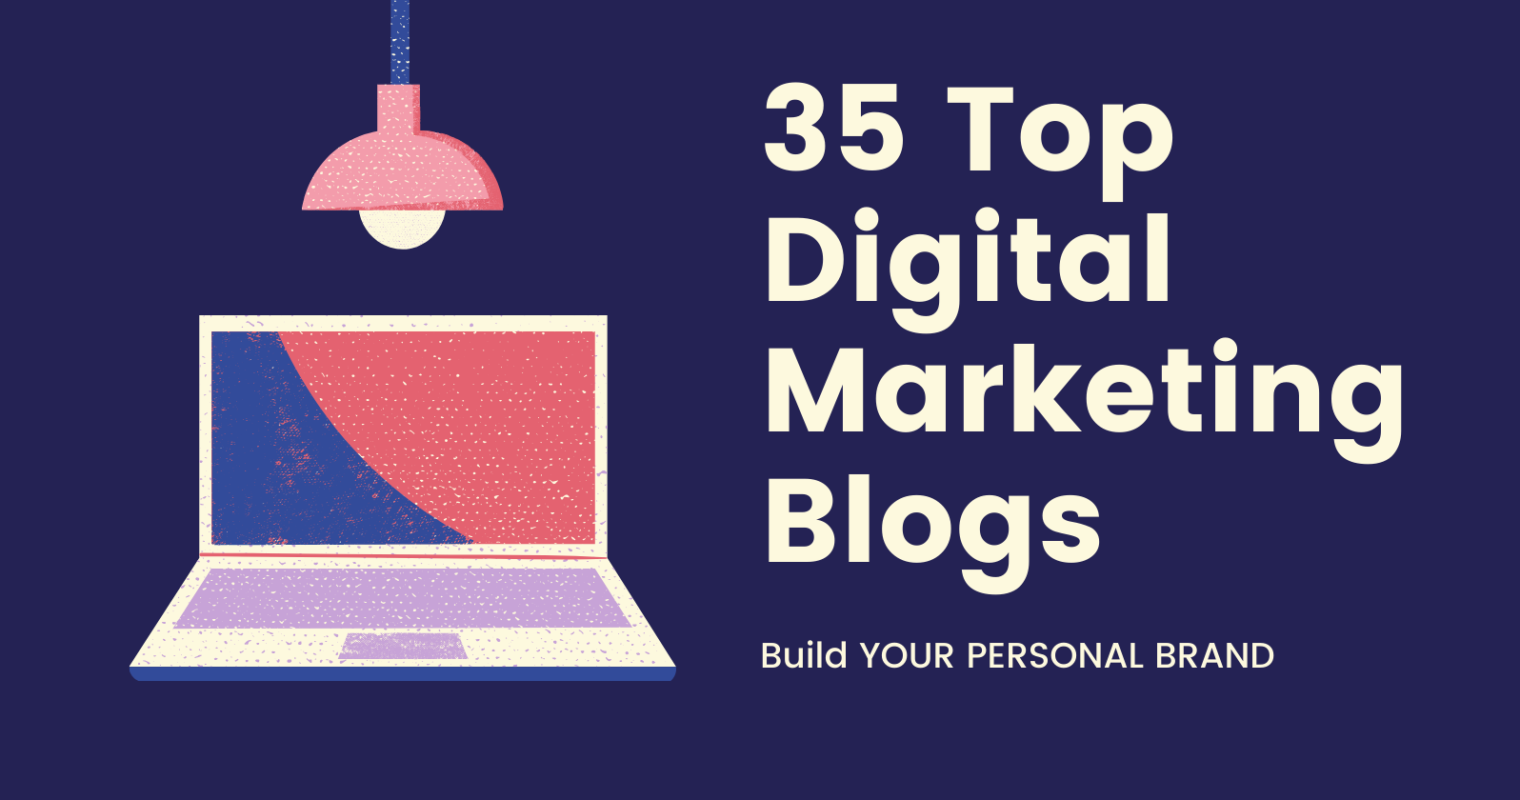 35 Top Digital Marketing Blogs That Accept Guest Posts